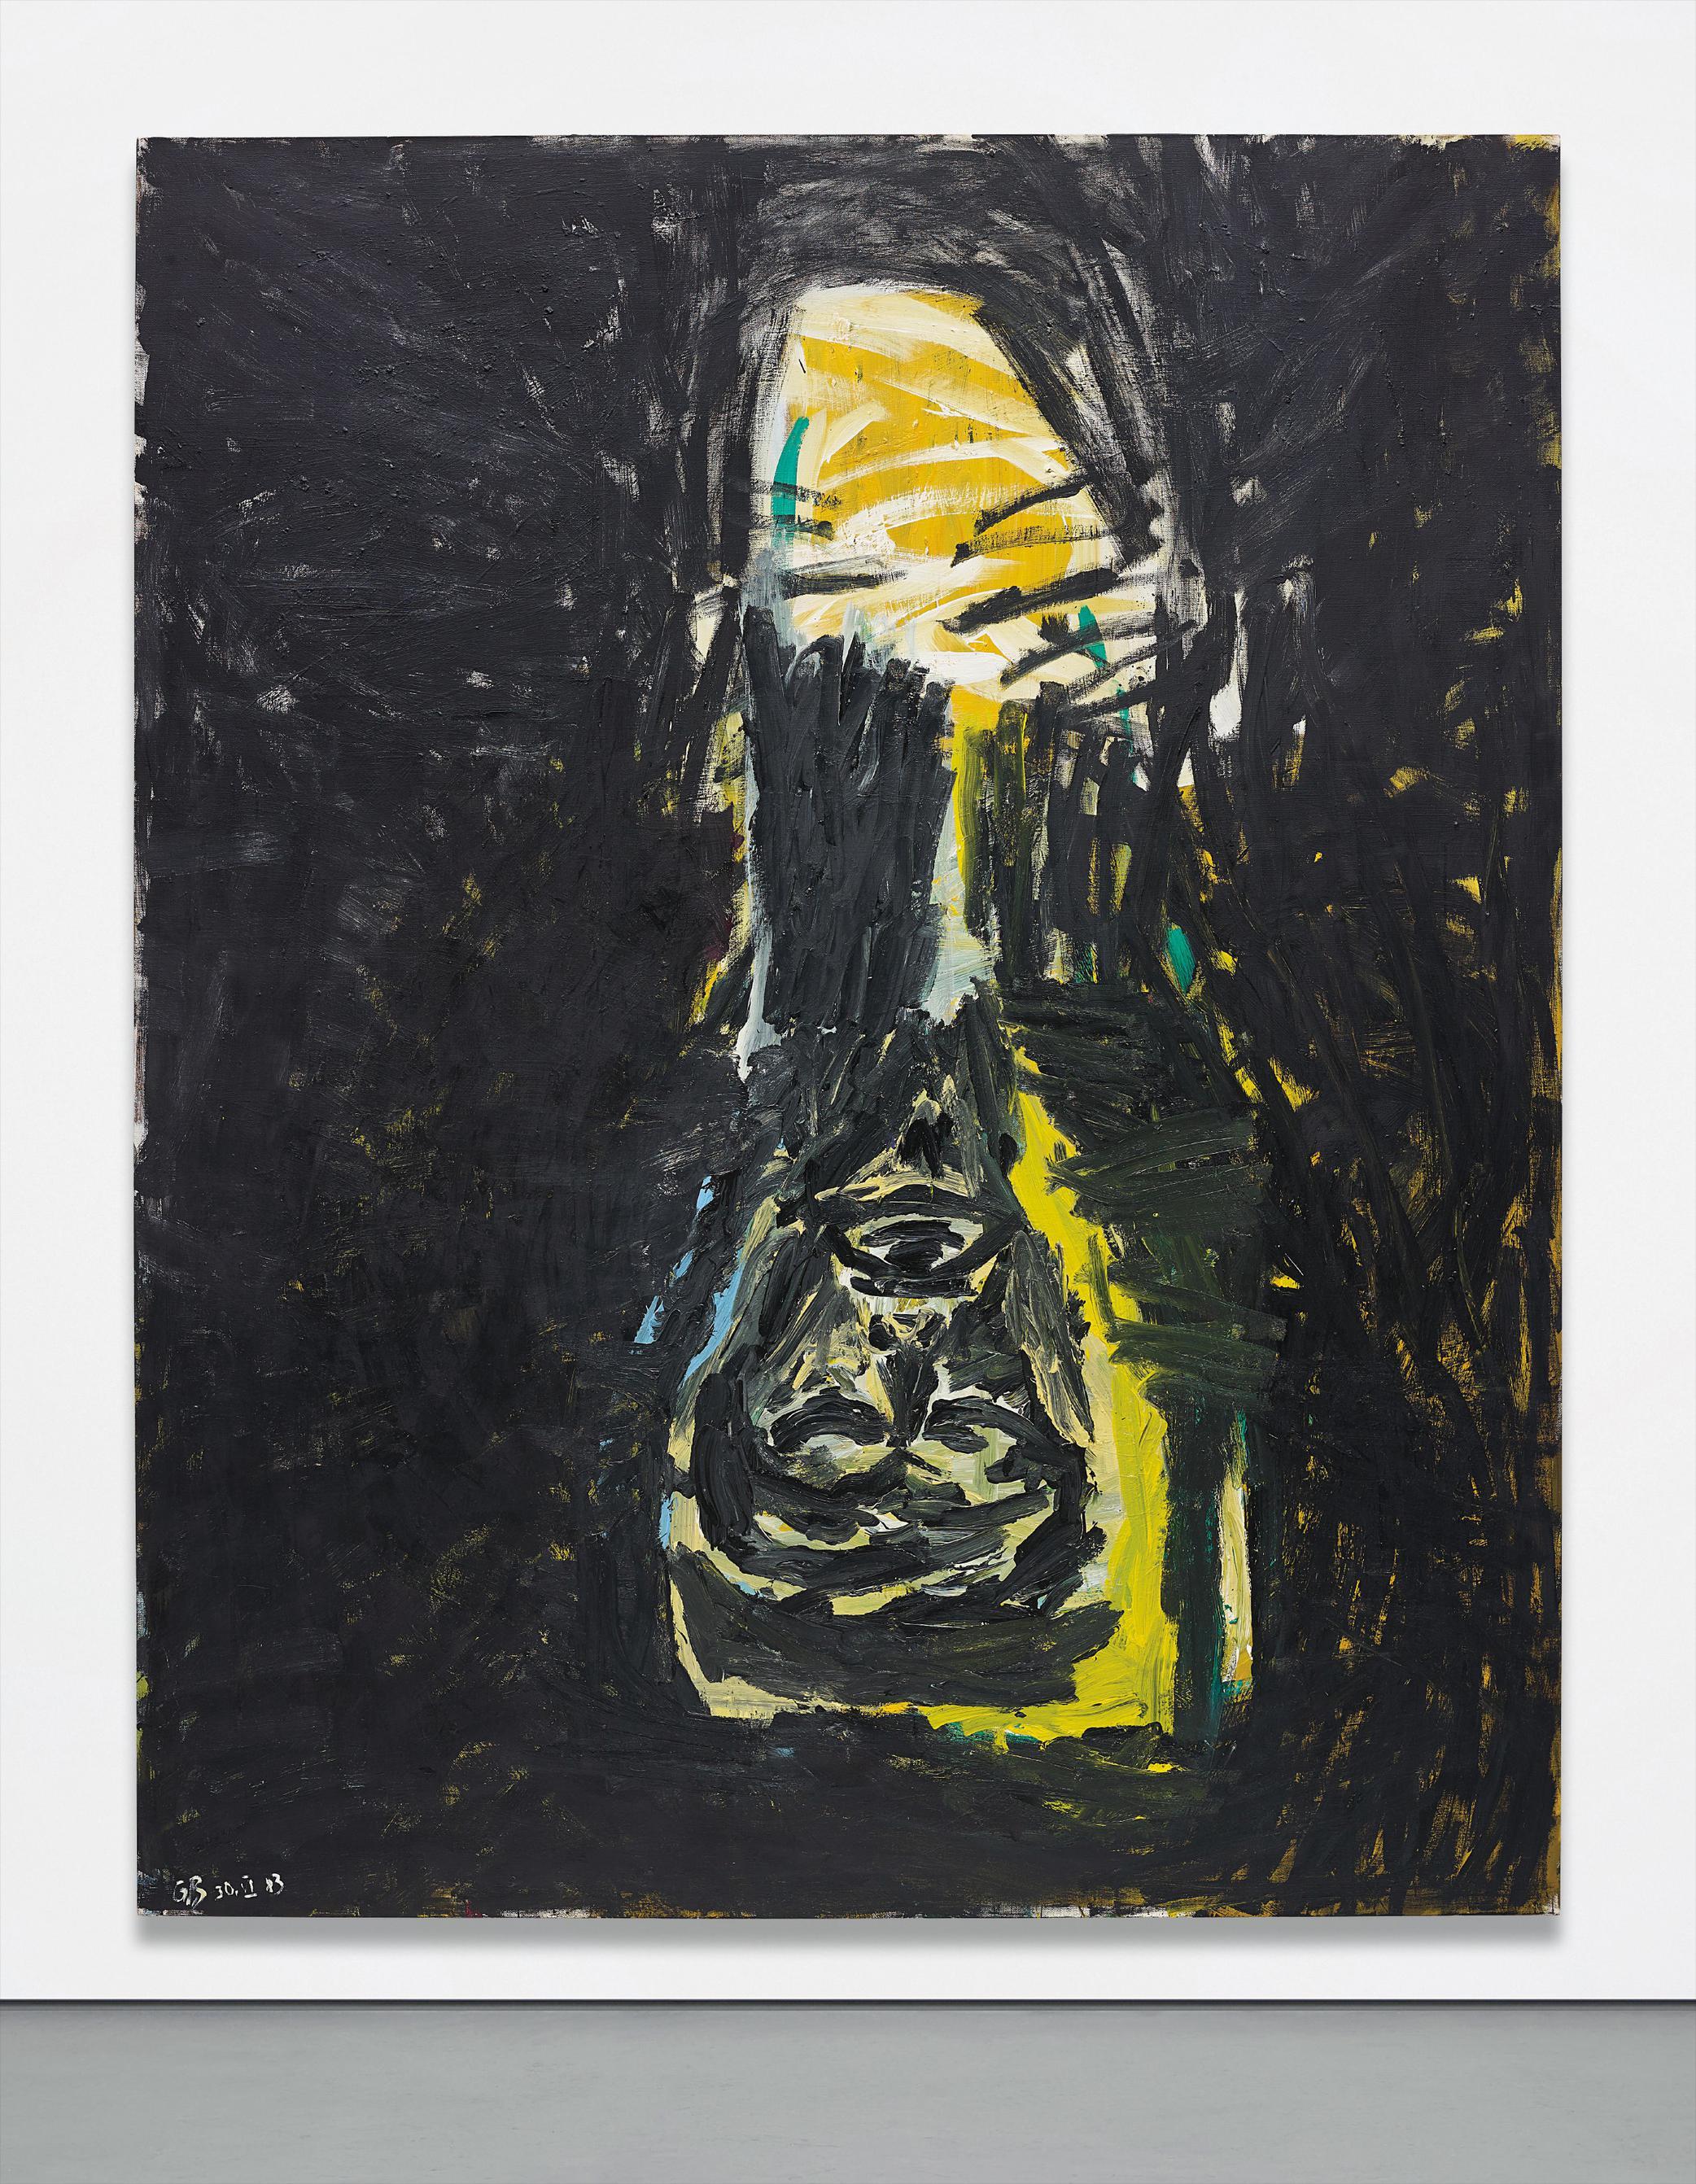 Georg Baselitz-Schwarze Saule (Black Column)-1983